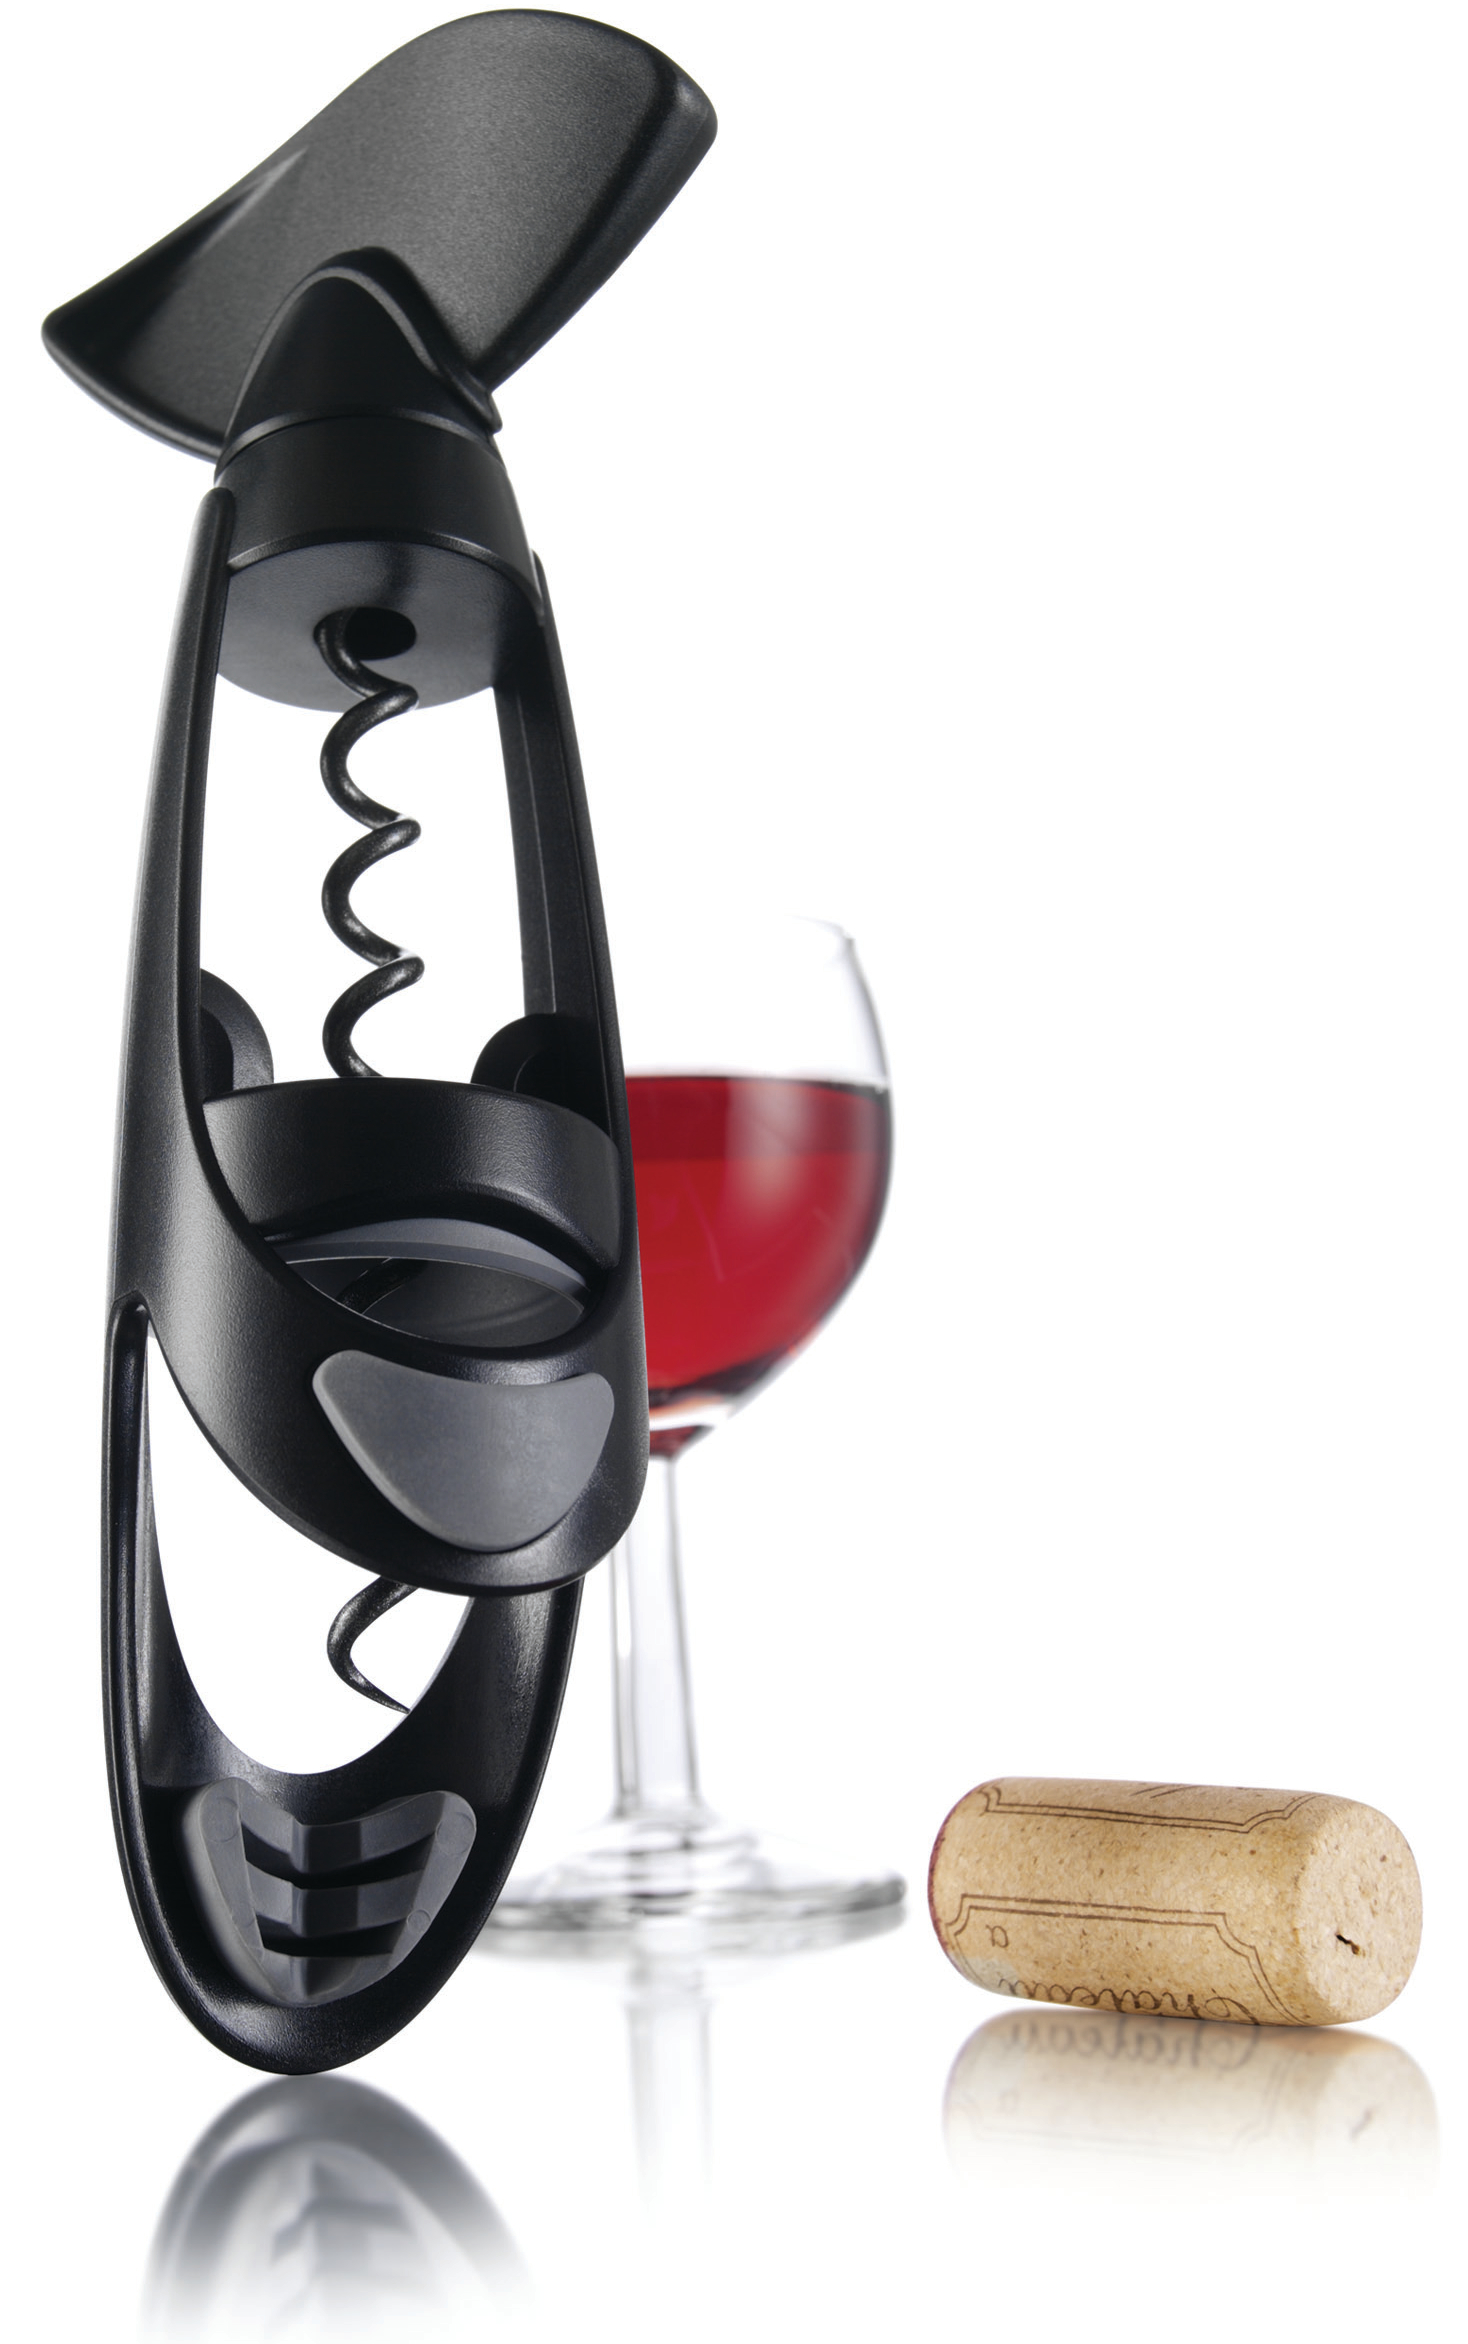 Vacu Vin Twister Corkscrew